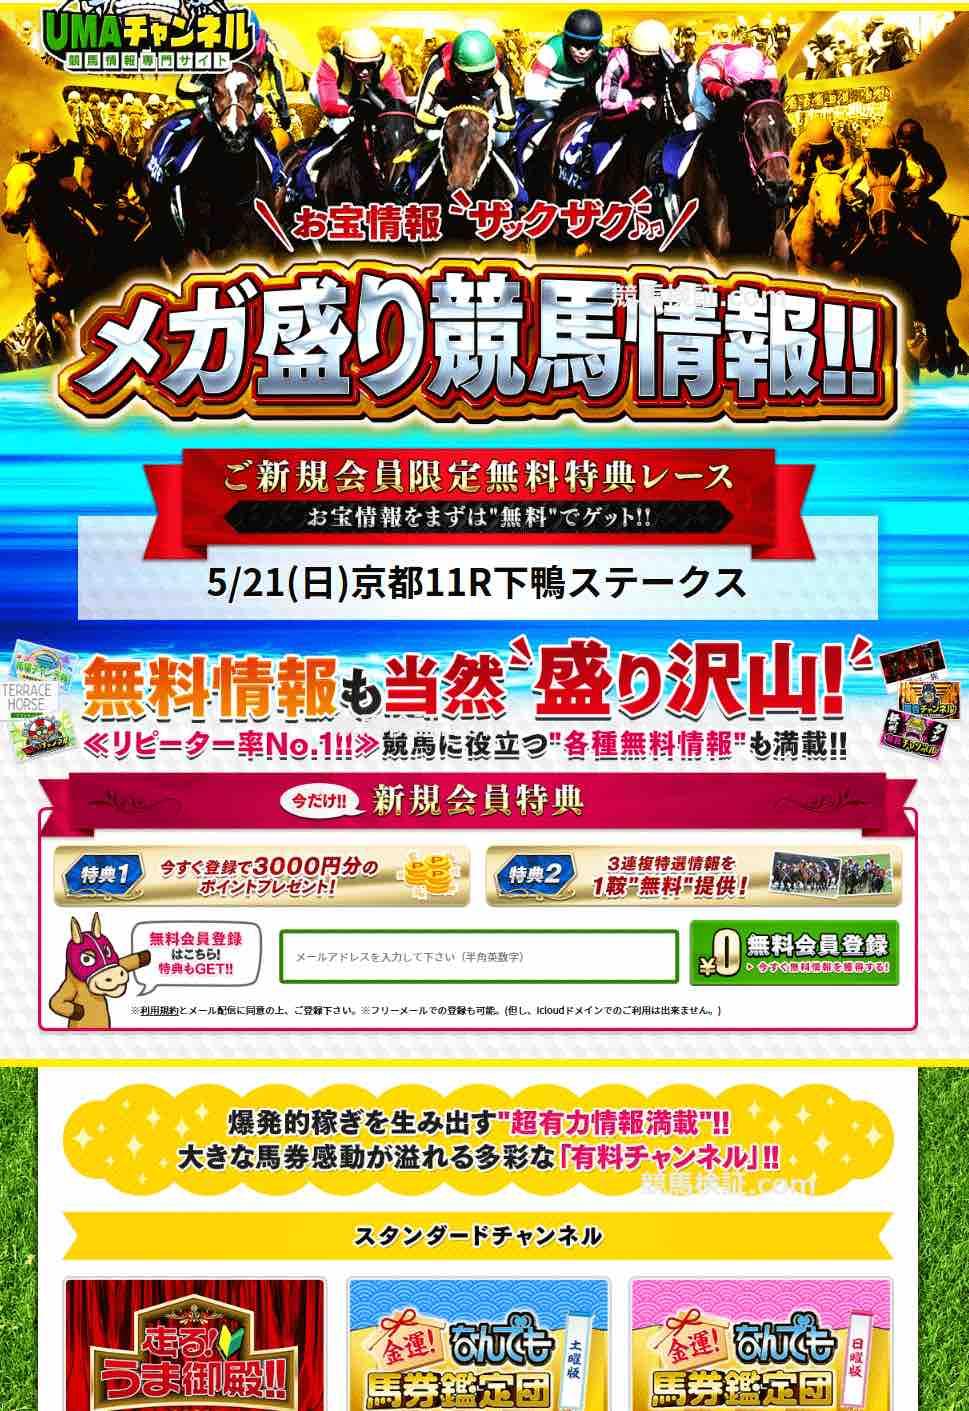 UMAチャンネルという競馬予想サイトの登録前ページ